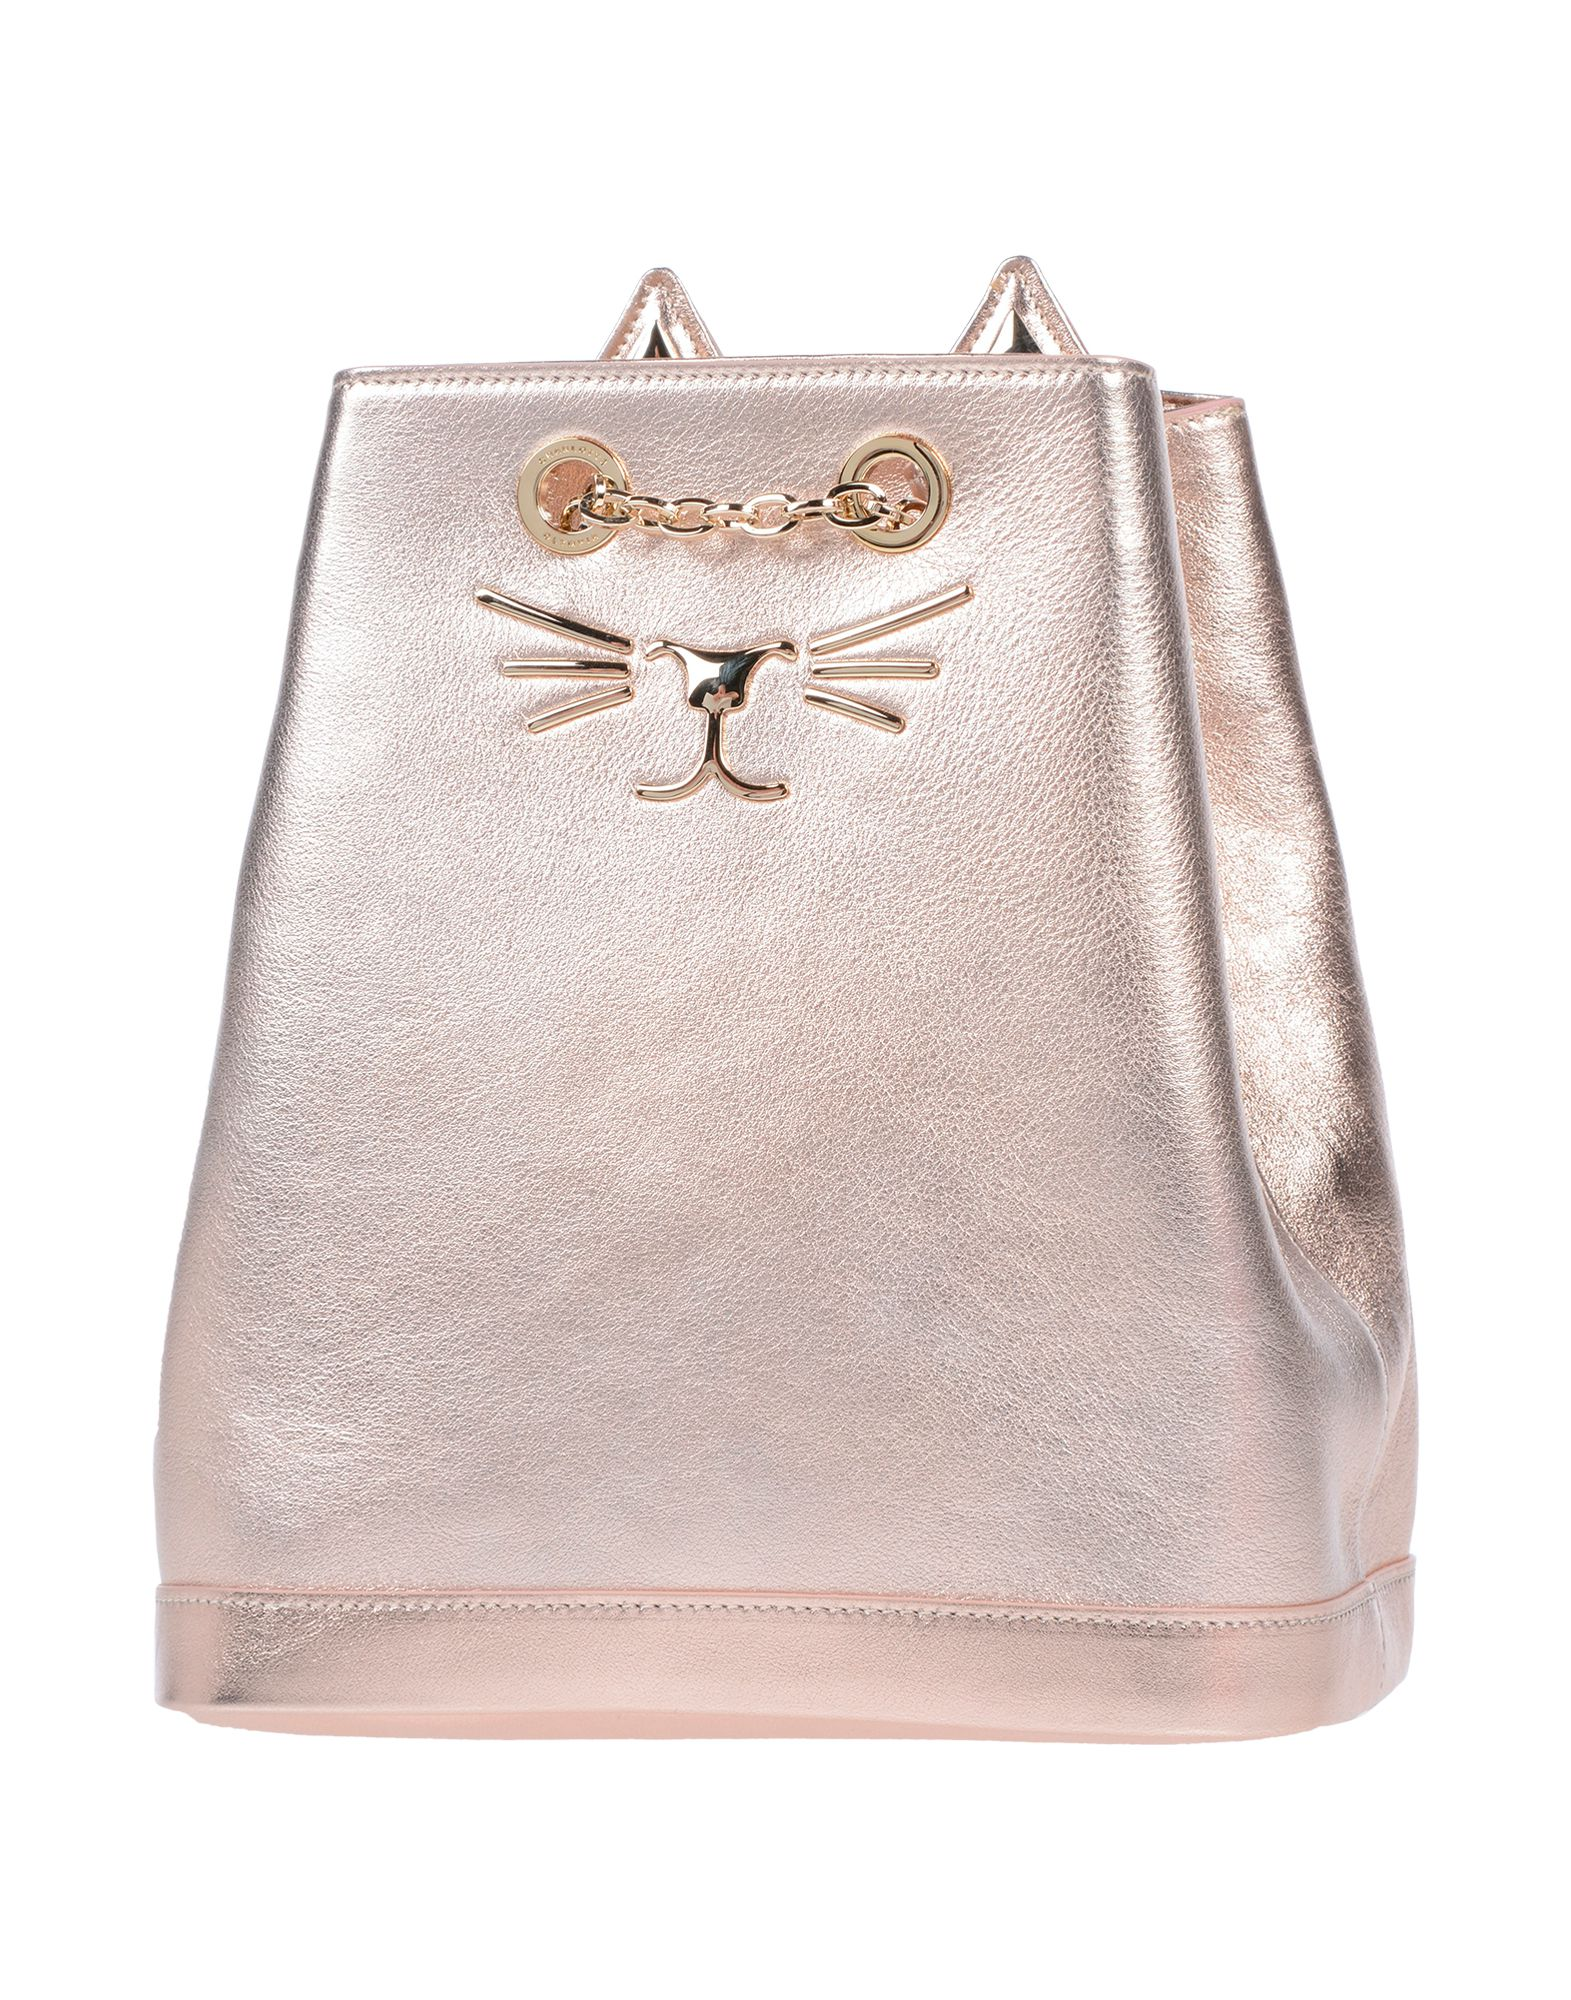 CHARLOTTE OLYMPIA Рюкзаки и сумки на пояс charlotte olympia эспадрильи из кожи и льна mischievous flats